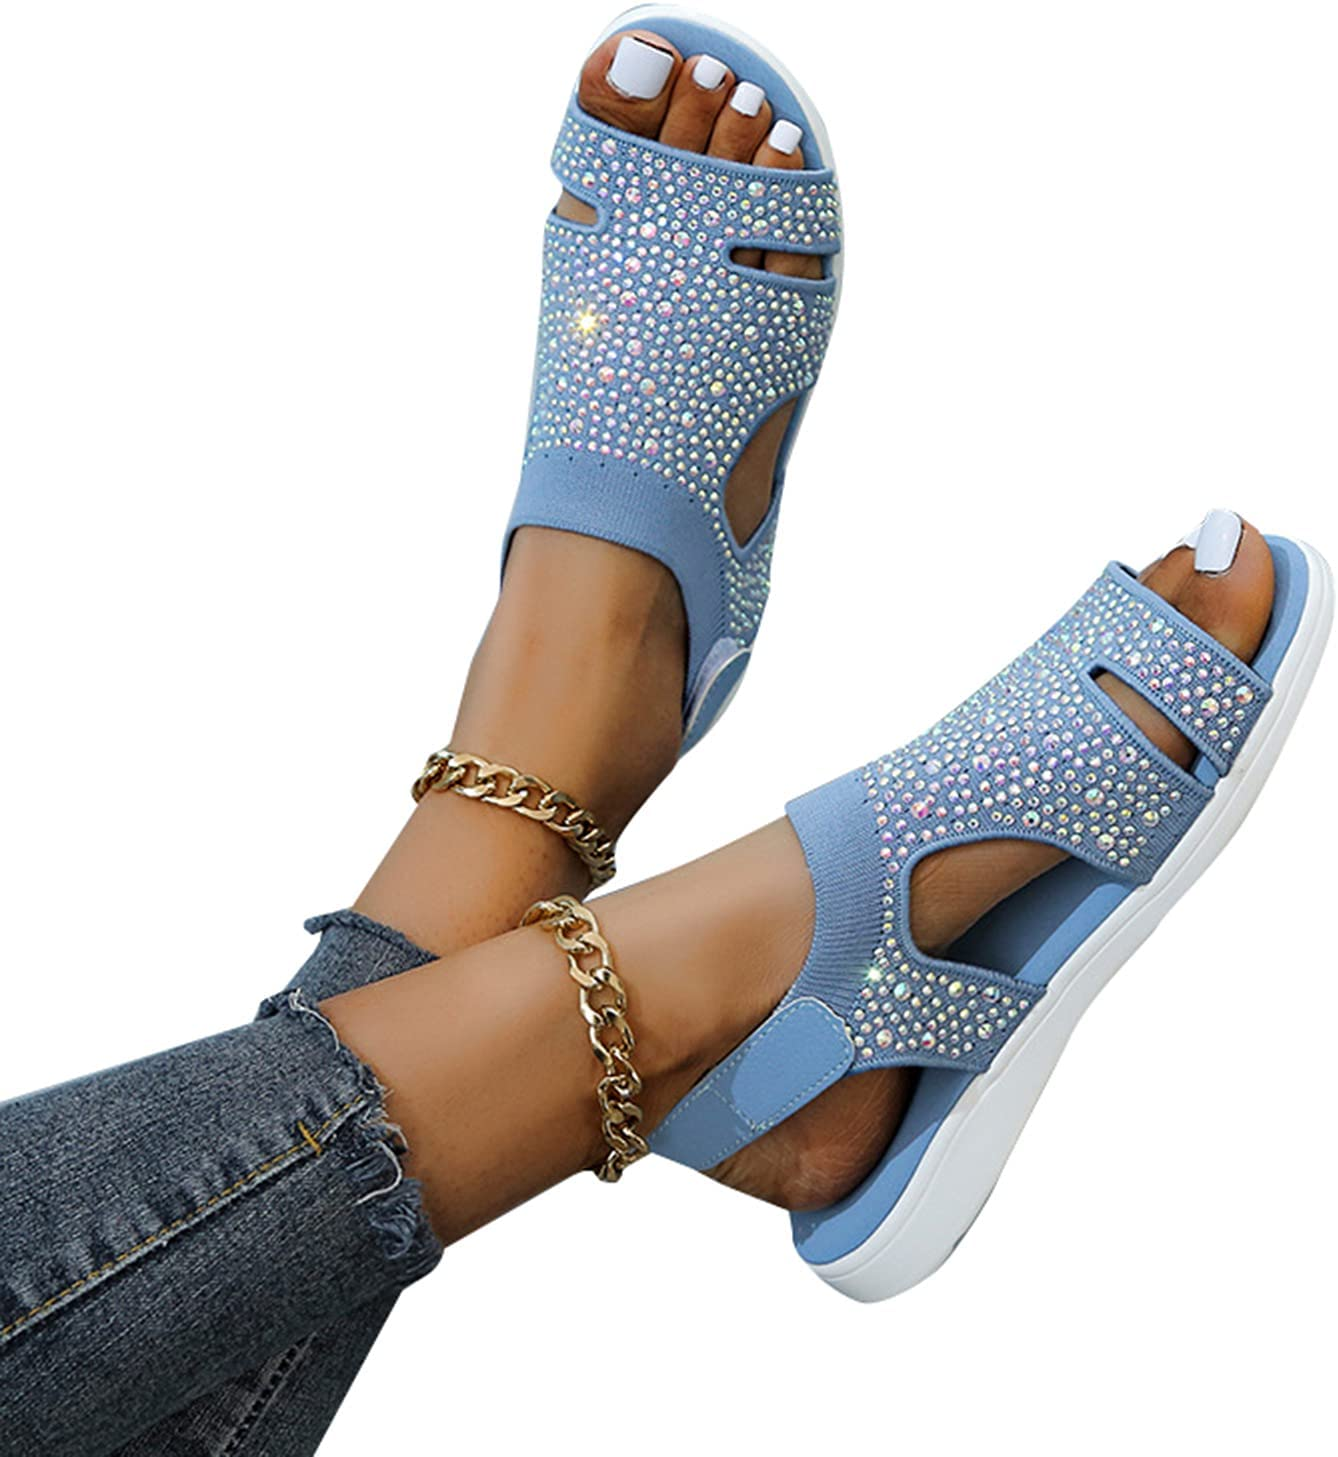 LEFUYAN Women's Sandal Comfort Slides Beach Shoes Buckle Design Summer Beach Shoes For Outdoor